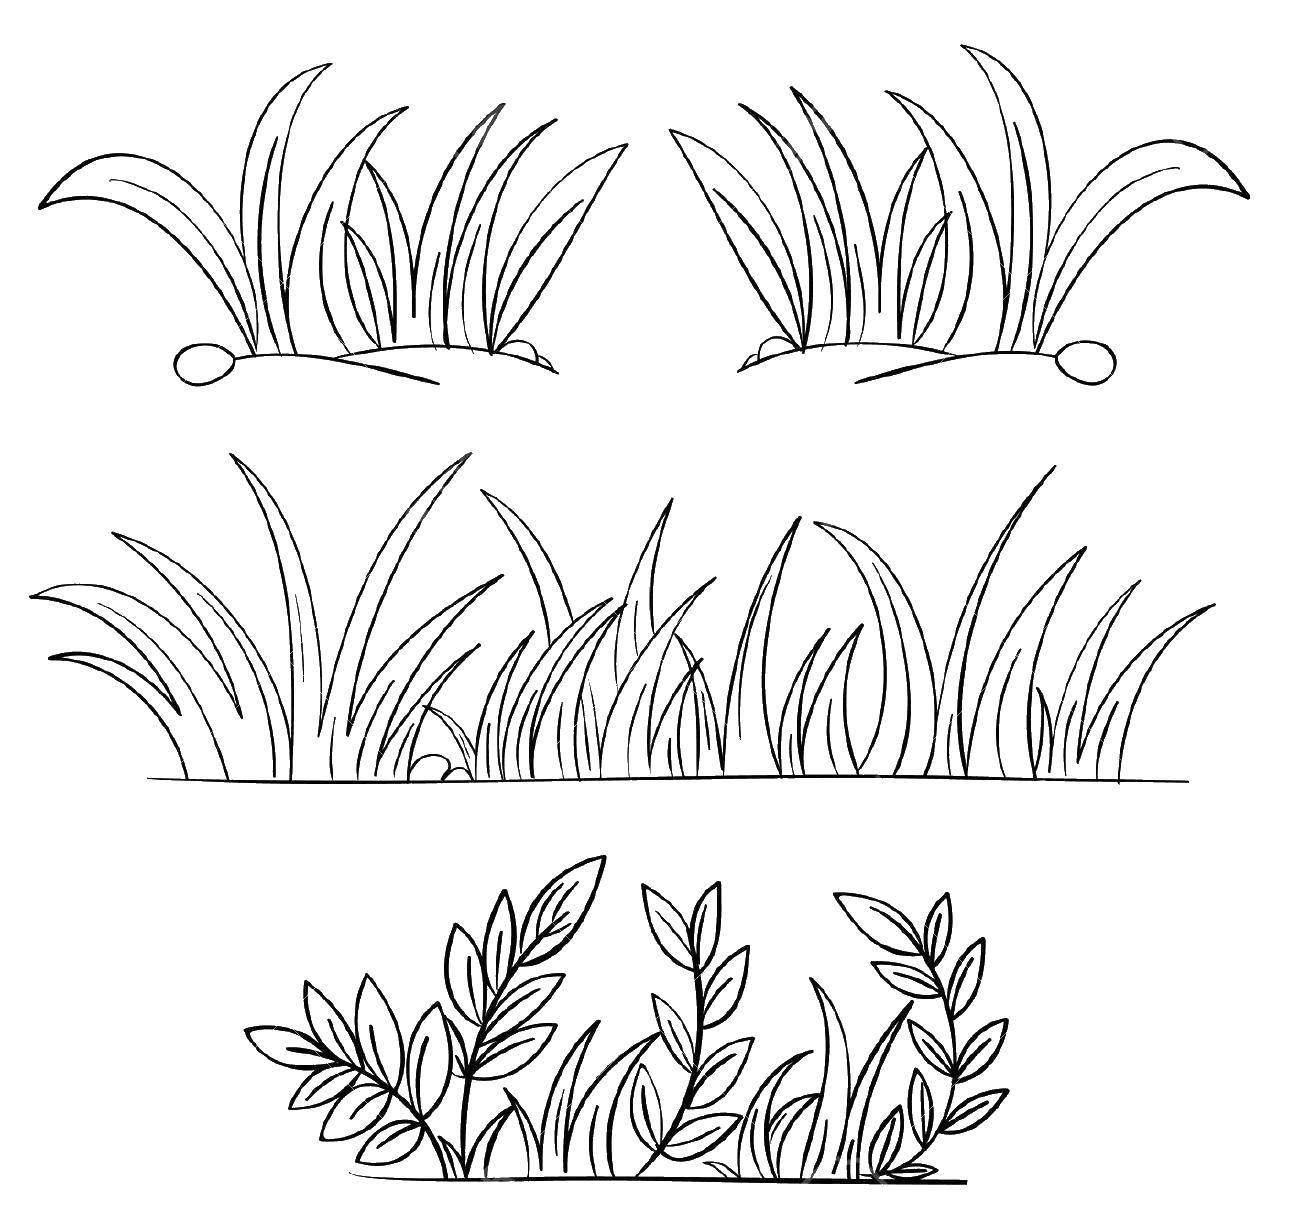 Coloring pages The outline for cutting Скачать .  Распечатать